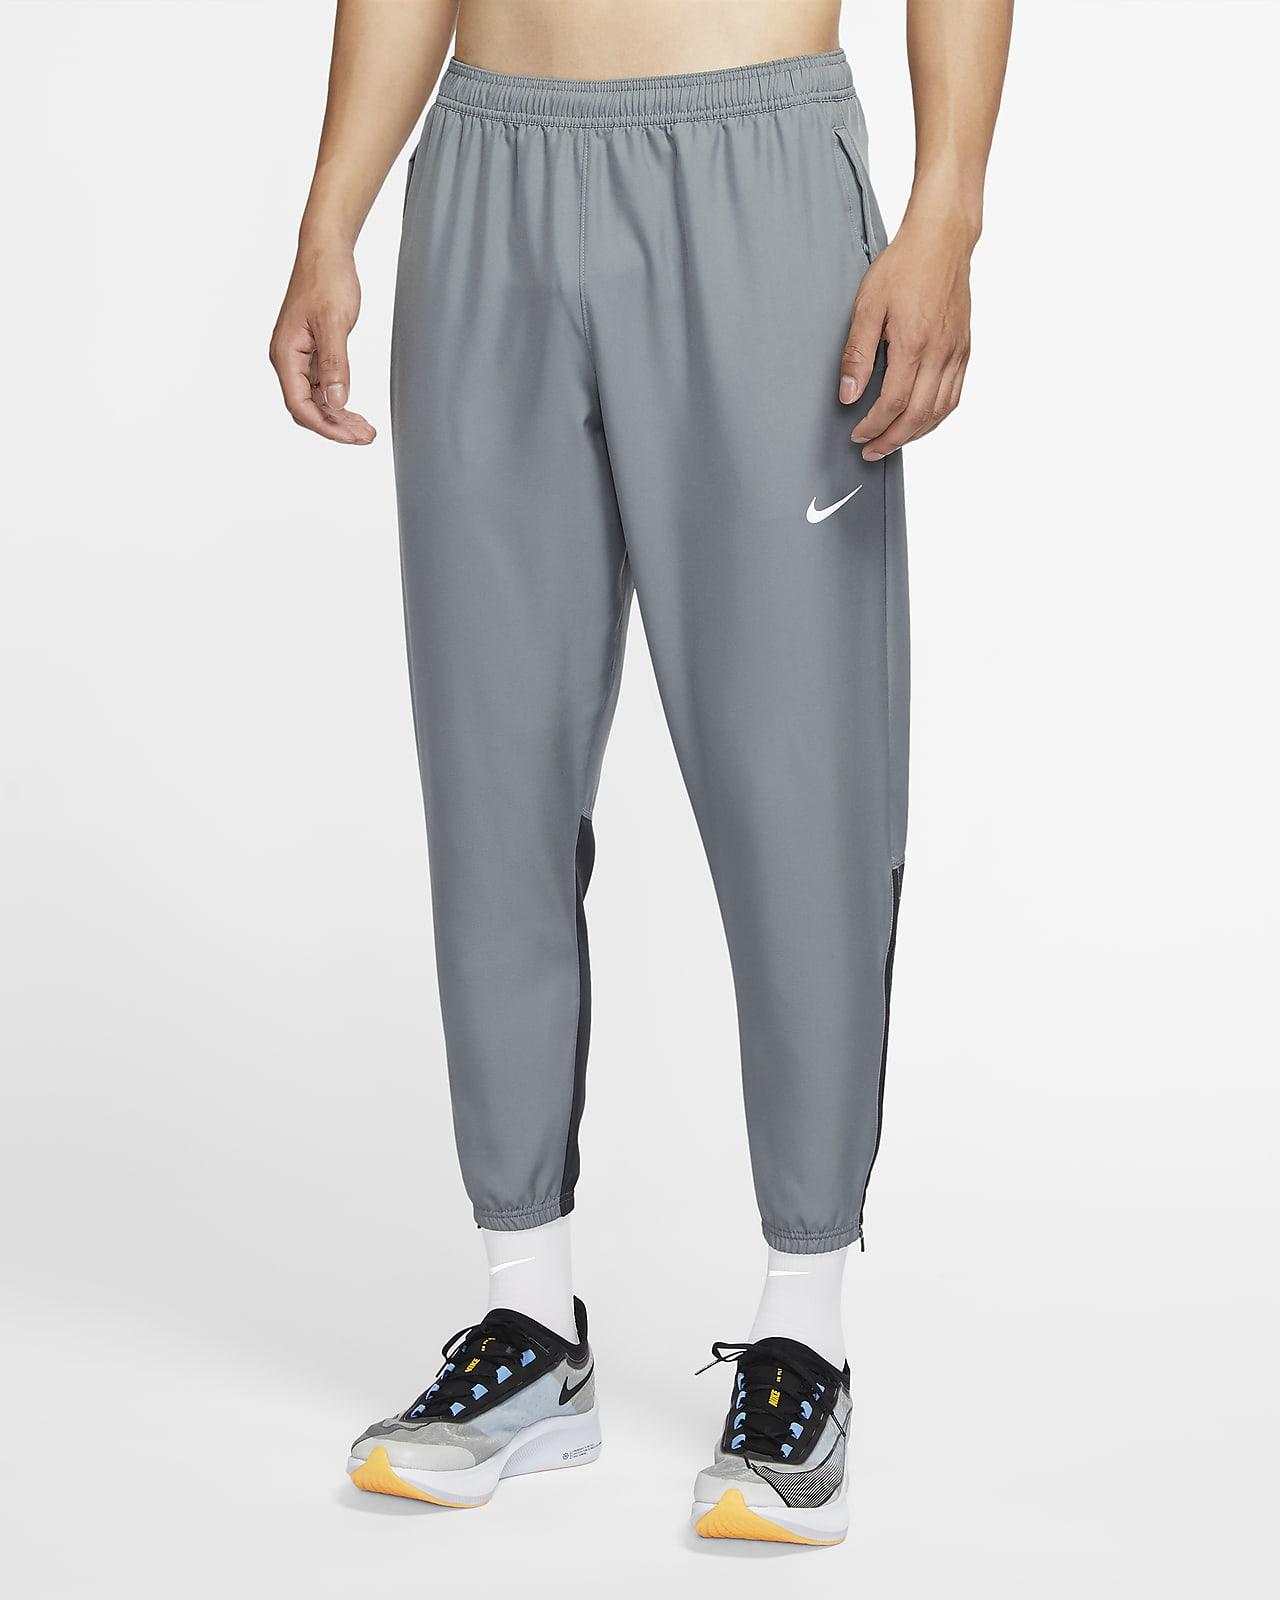 Acuario gasolina firma  Nike Essential Men's Woven Running Pants. Nike.com